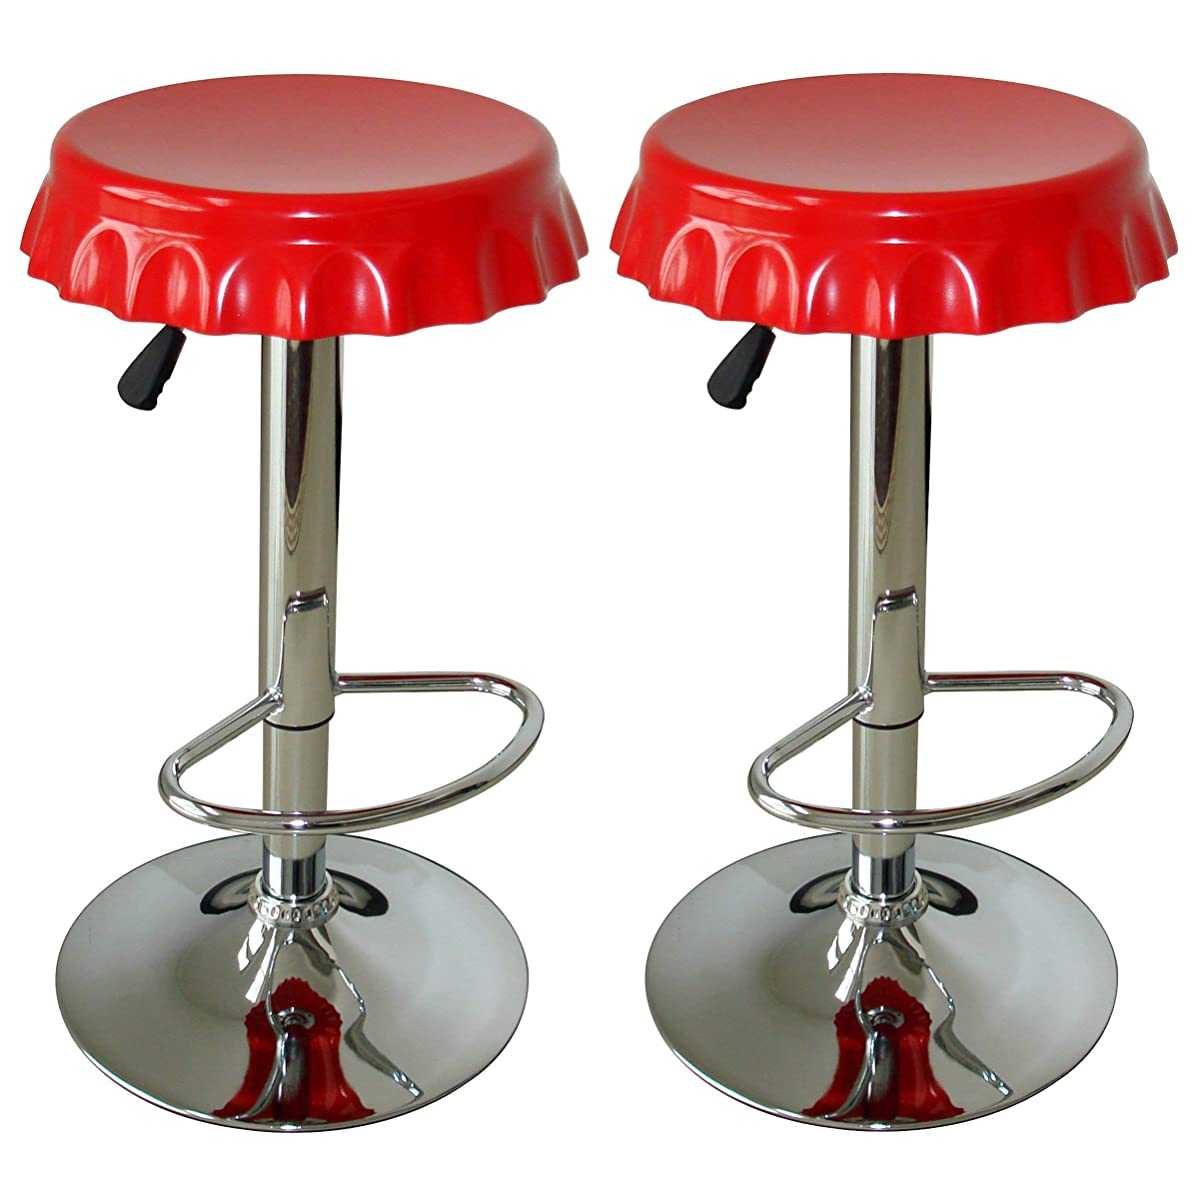 AmeriHome Retro Soda Cap Bar Stool - 2 Pc Red - N/A